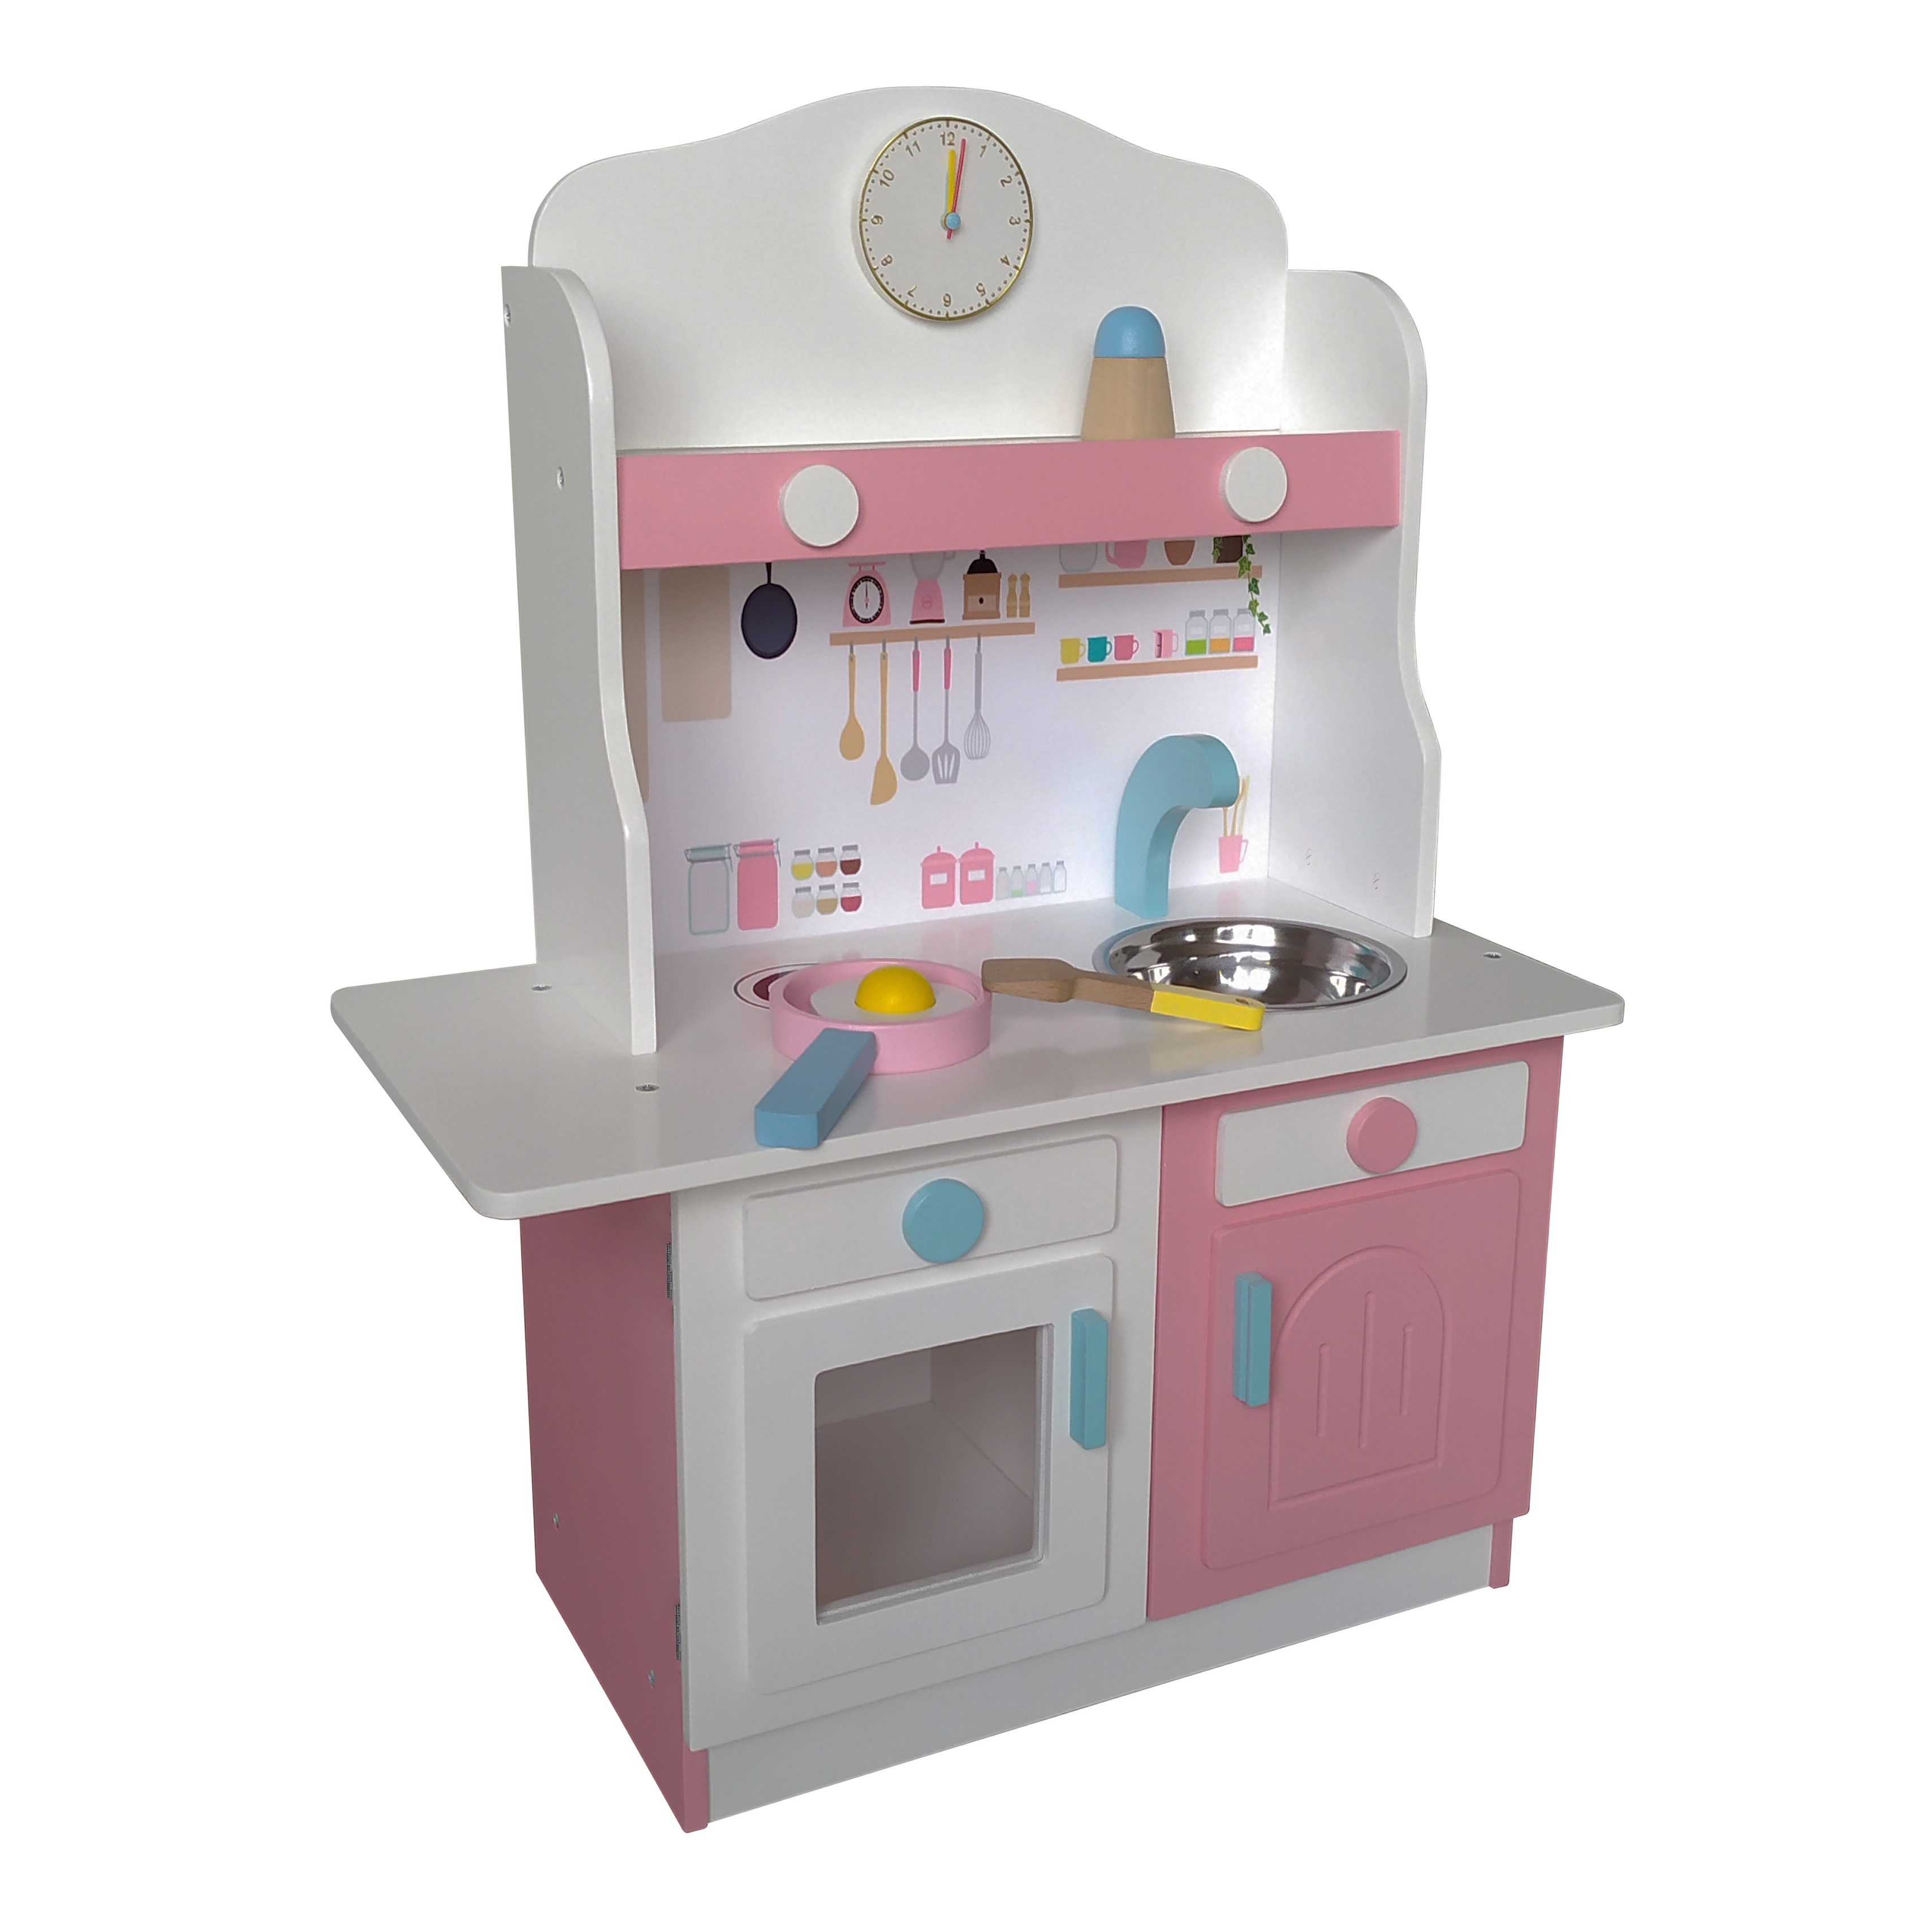 Cocina blanca con rosado - Gamepower - Juguetes de Madera